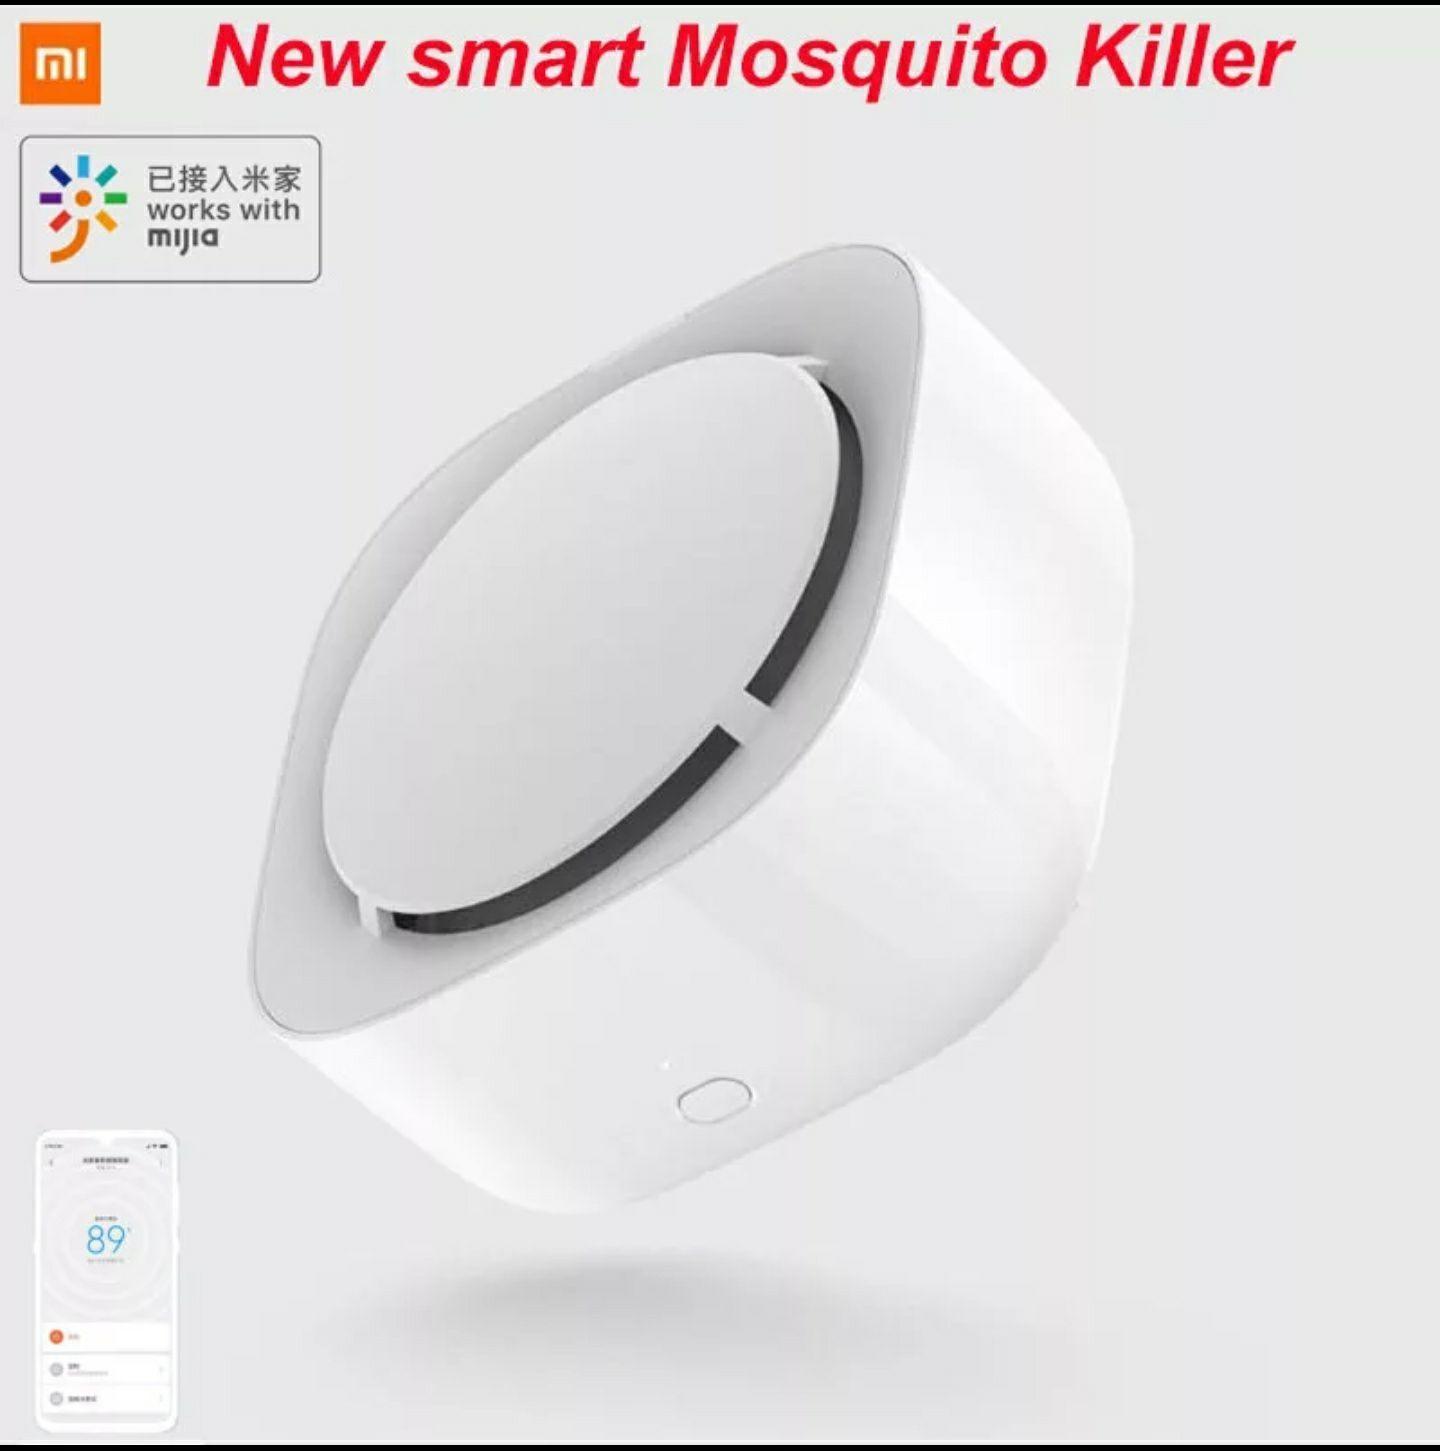 Nuevo Xiaomi Mijia repelente de mosquitos Killer